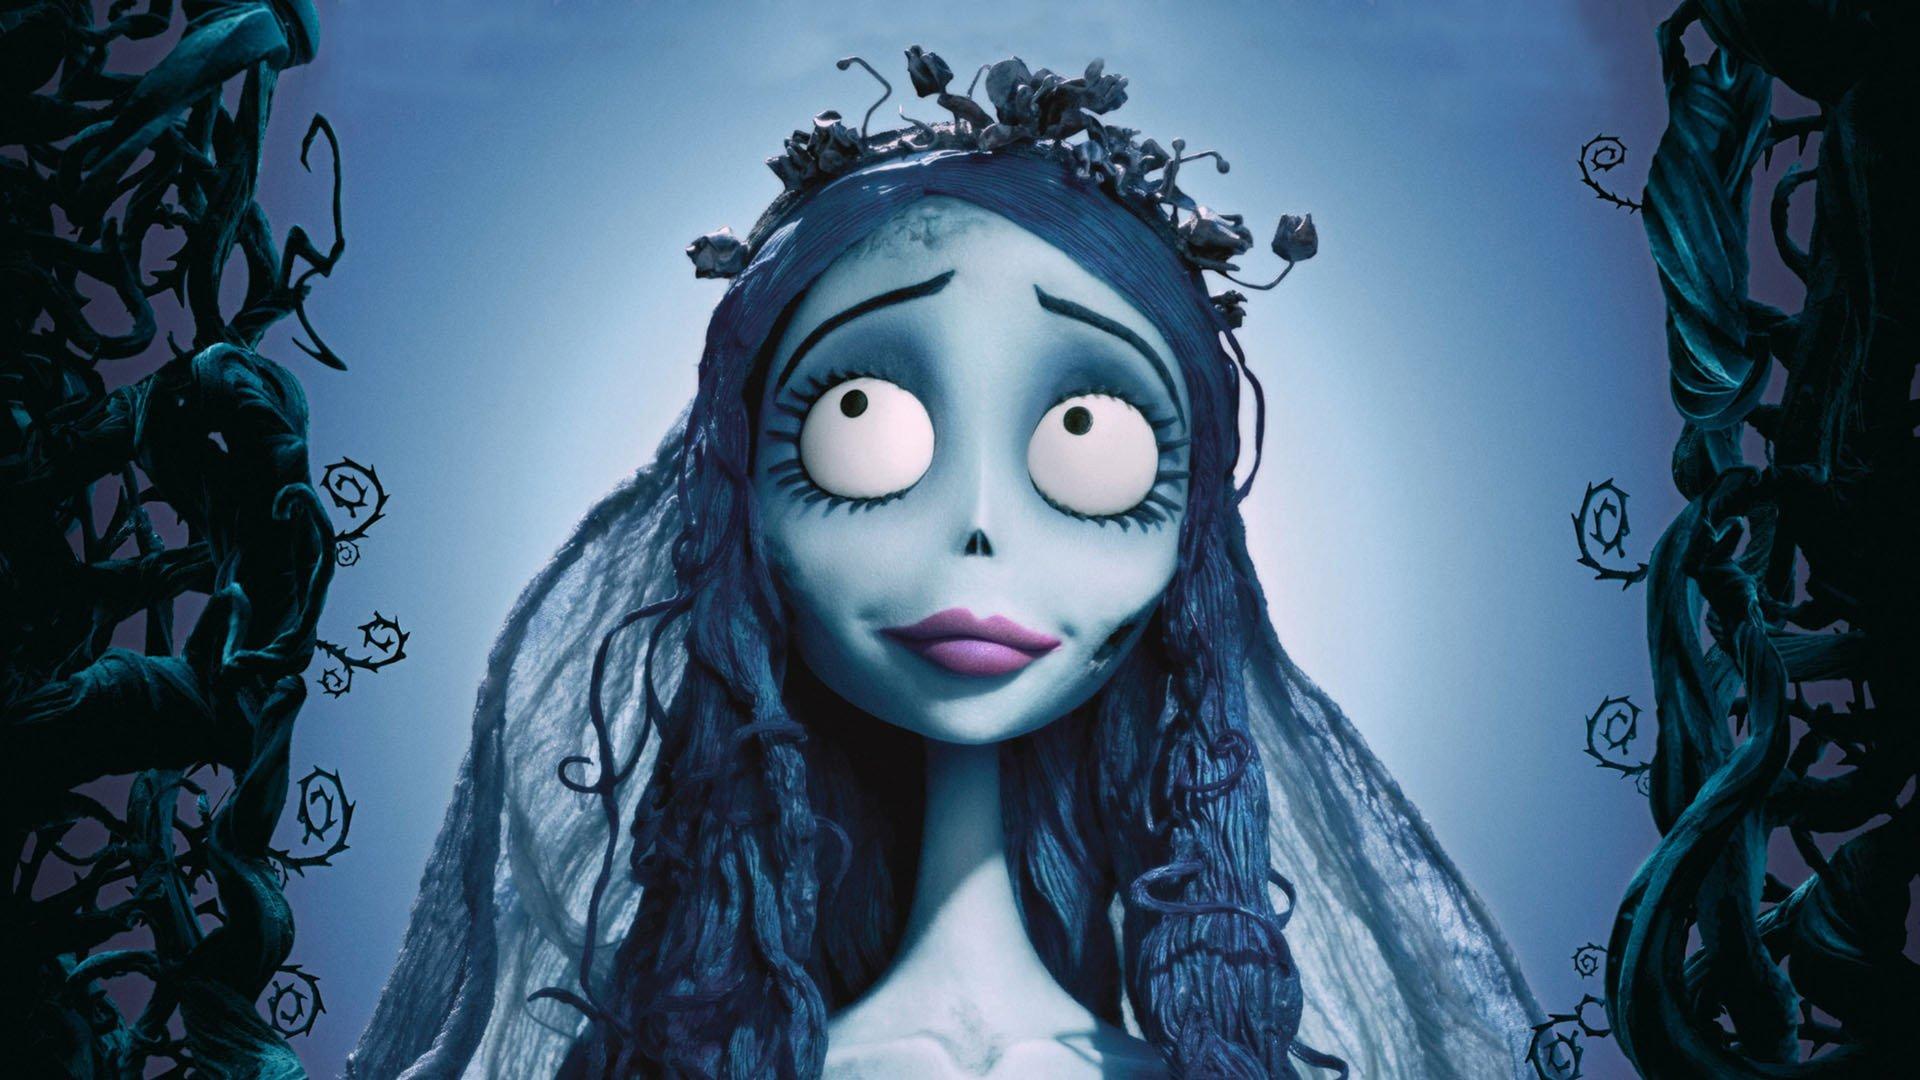 Corpse Bride Fondo De Pantalla Hd Fondo De Escritorio